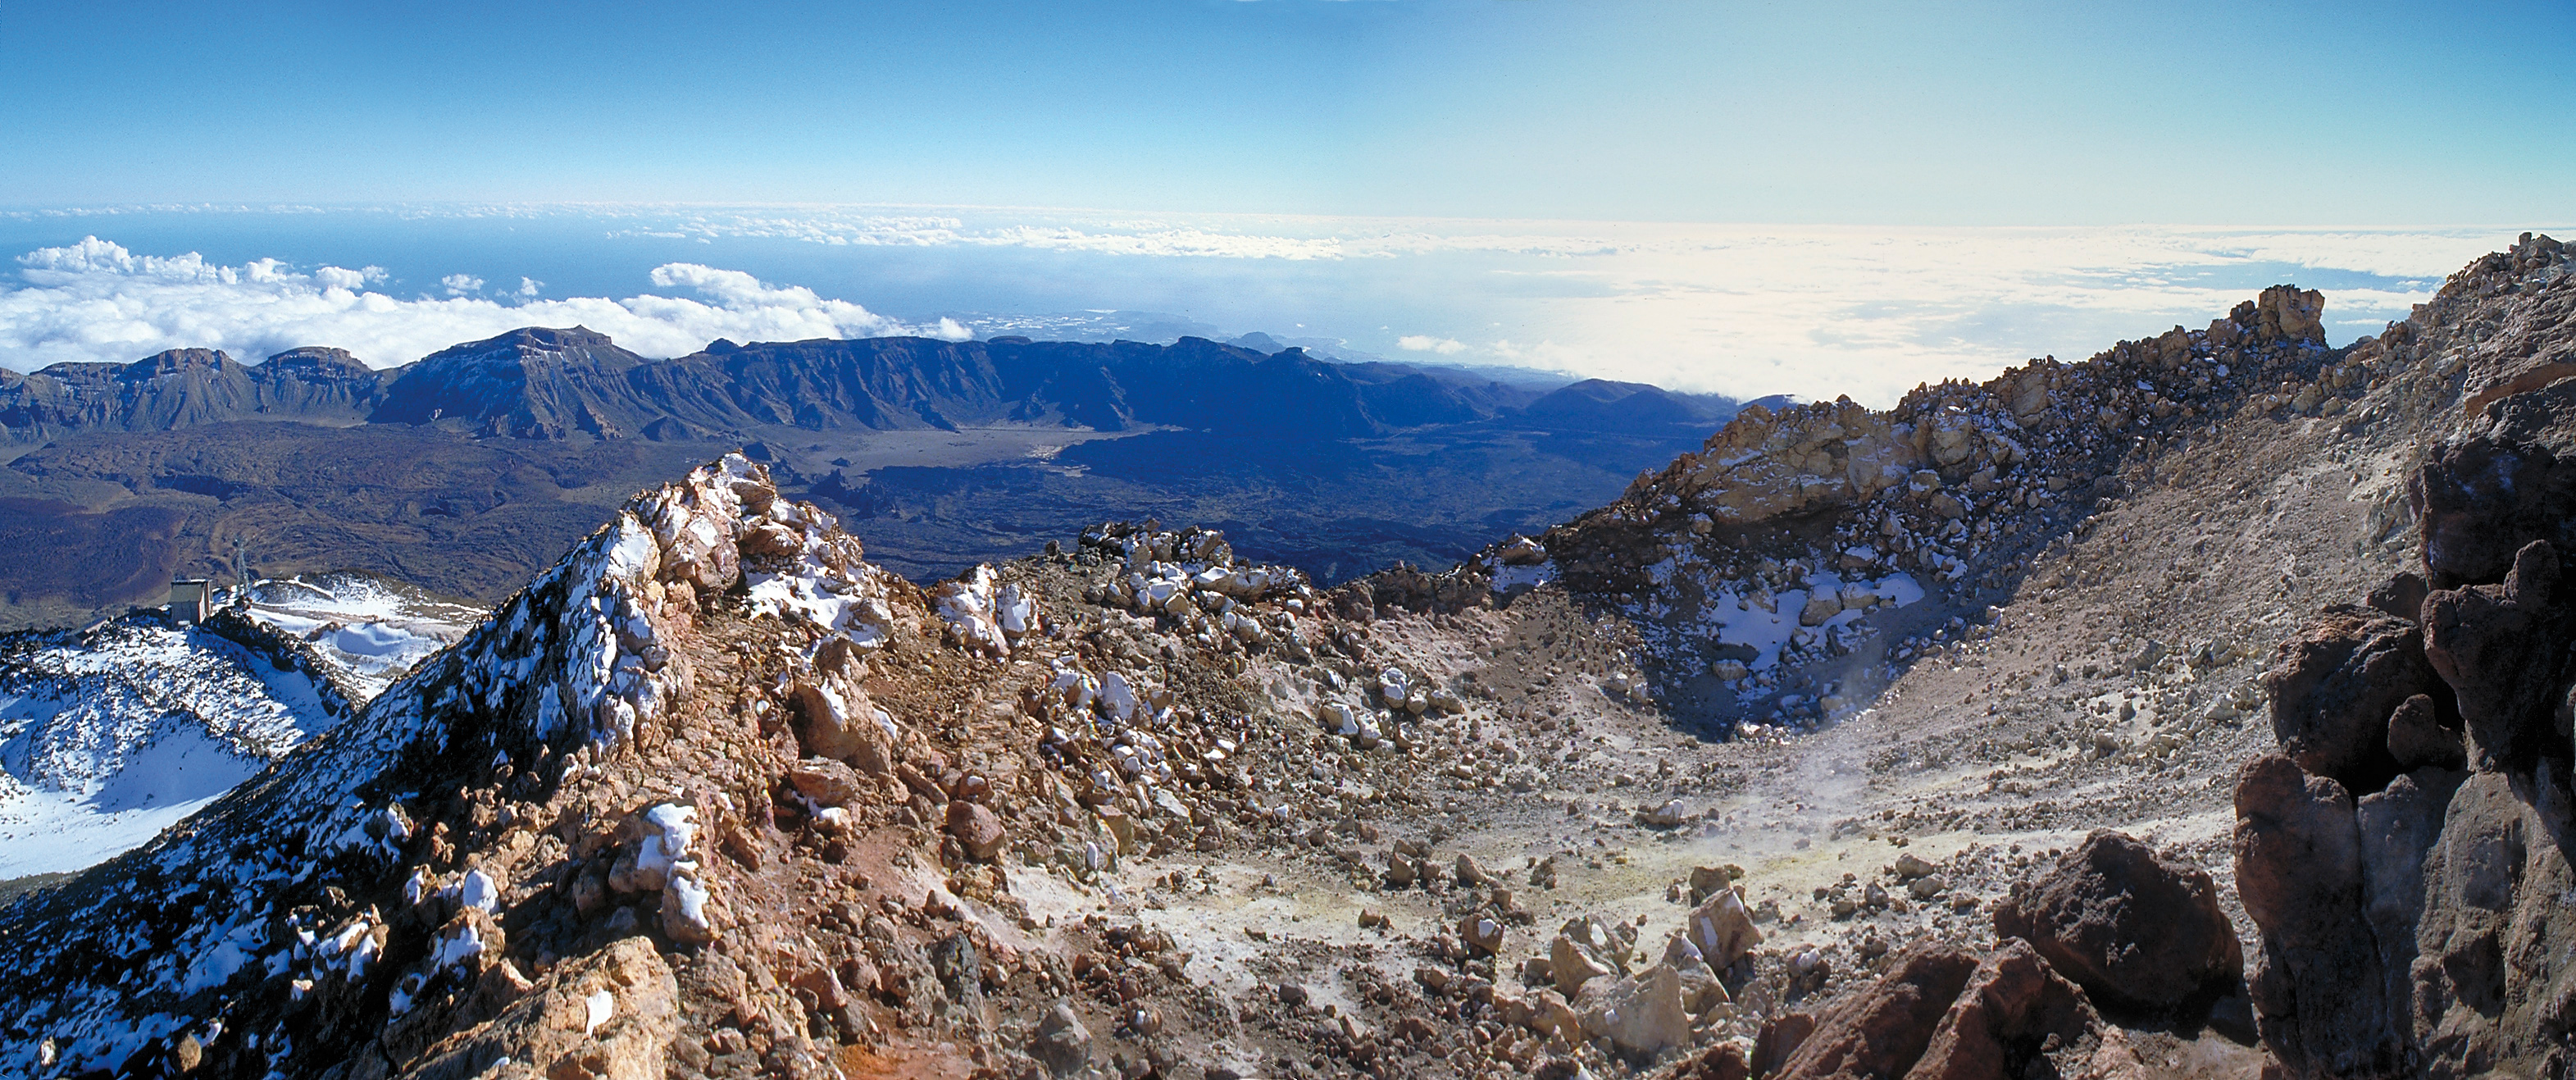 Formas alternativas de subir al Teide sin permiso